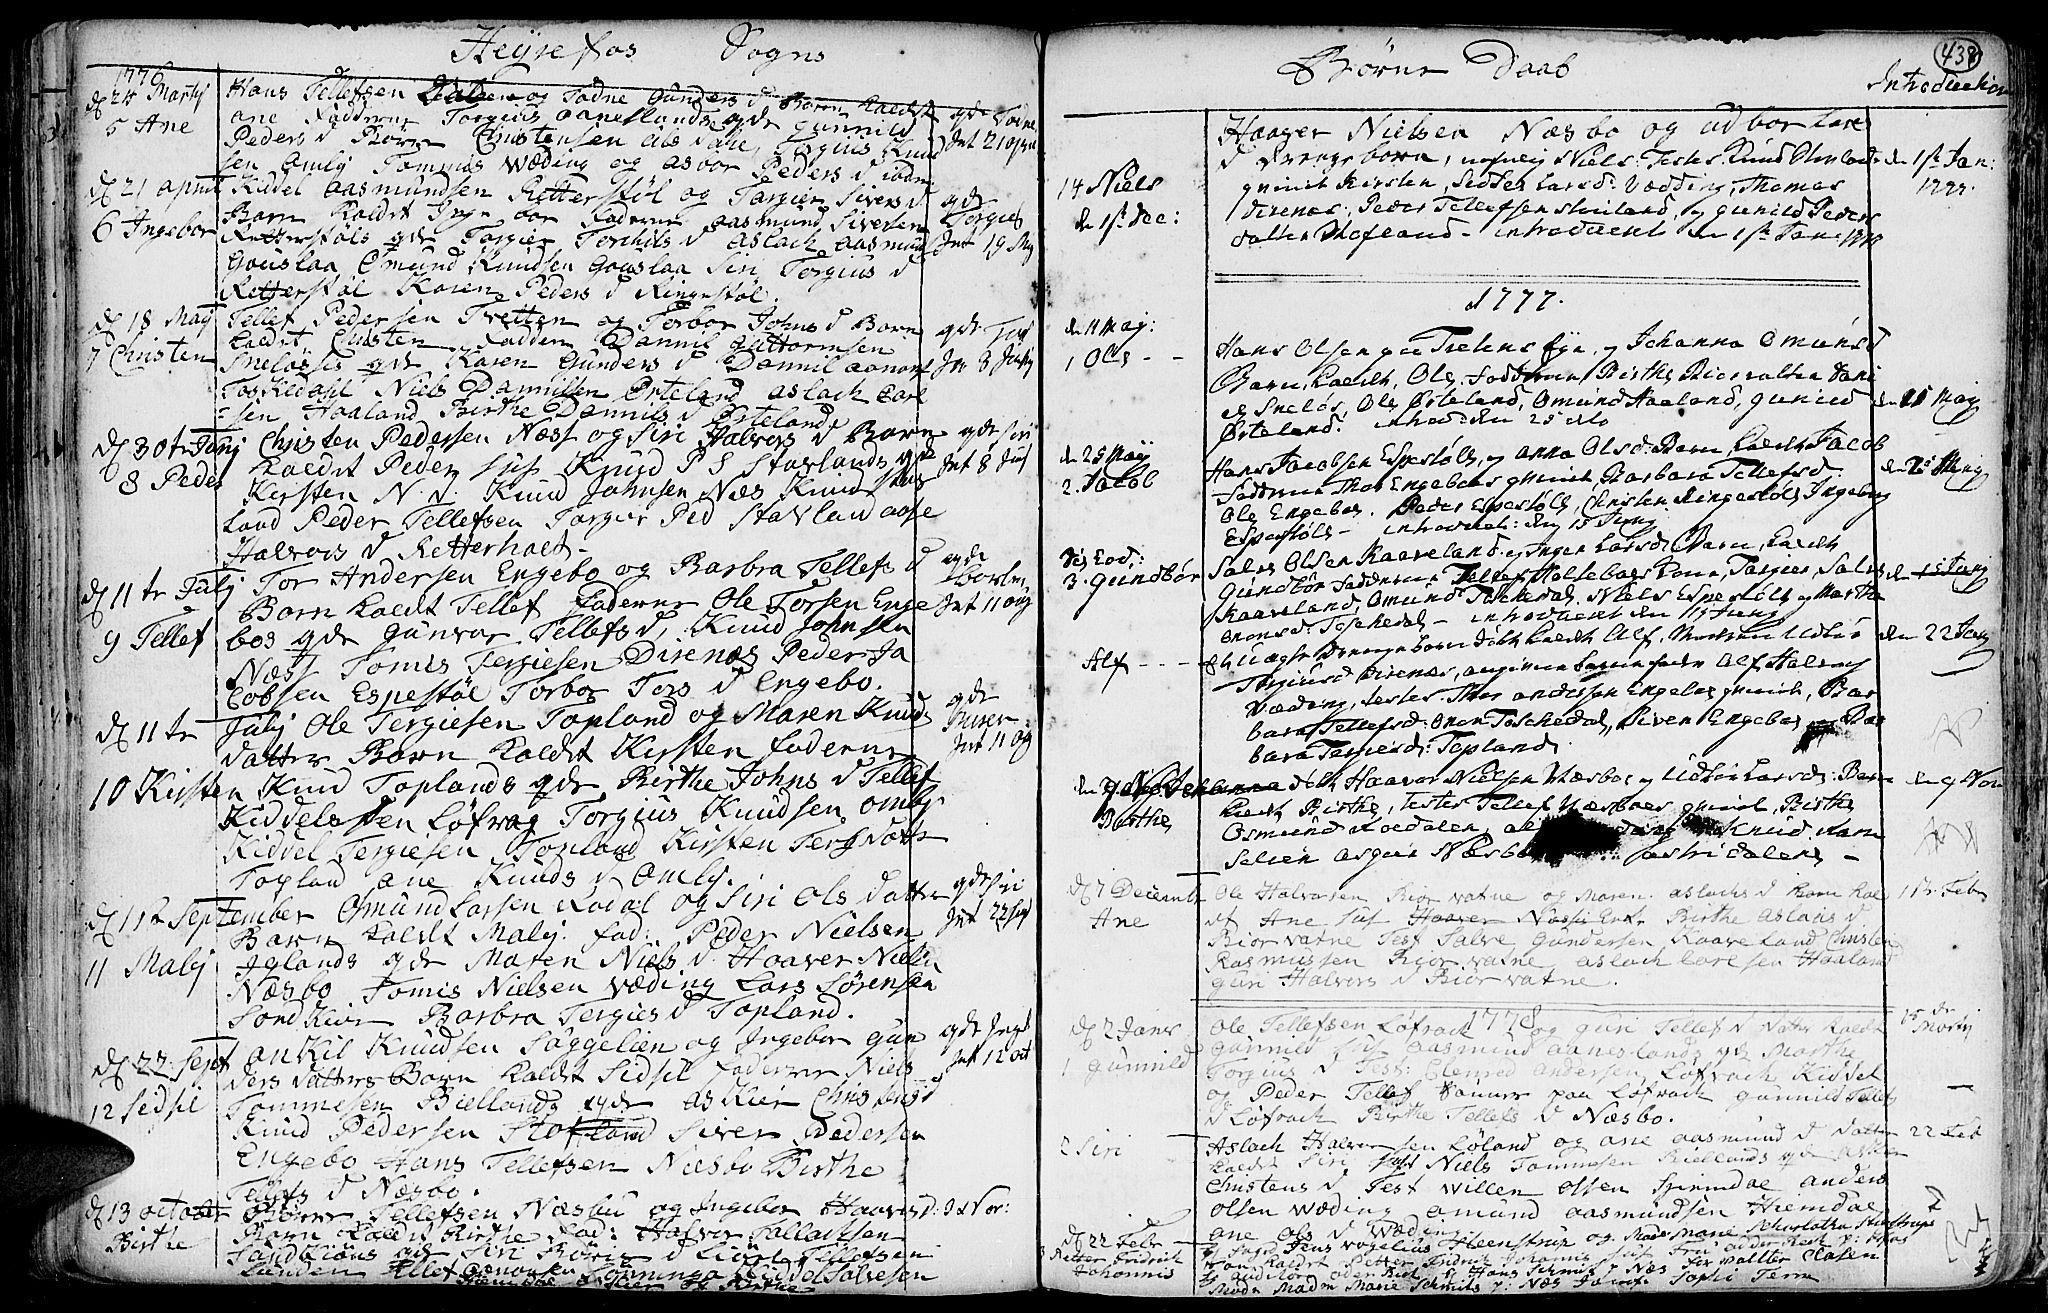 SAK, Hommedal sokneprestkontor, F/Fa/Fab/L0002: Ministerialbok nr. A 2 /3, 1740-1821, s. 438